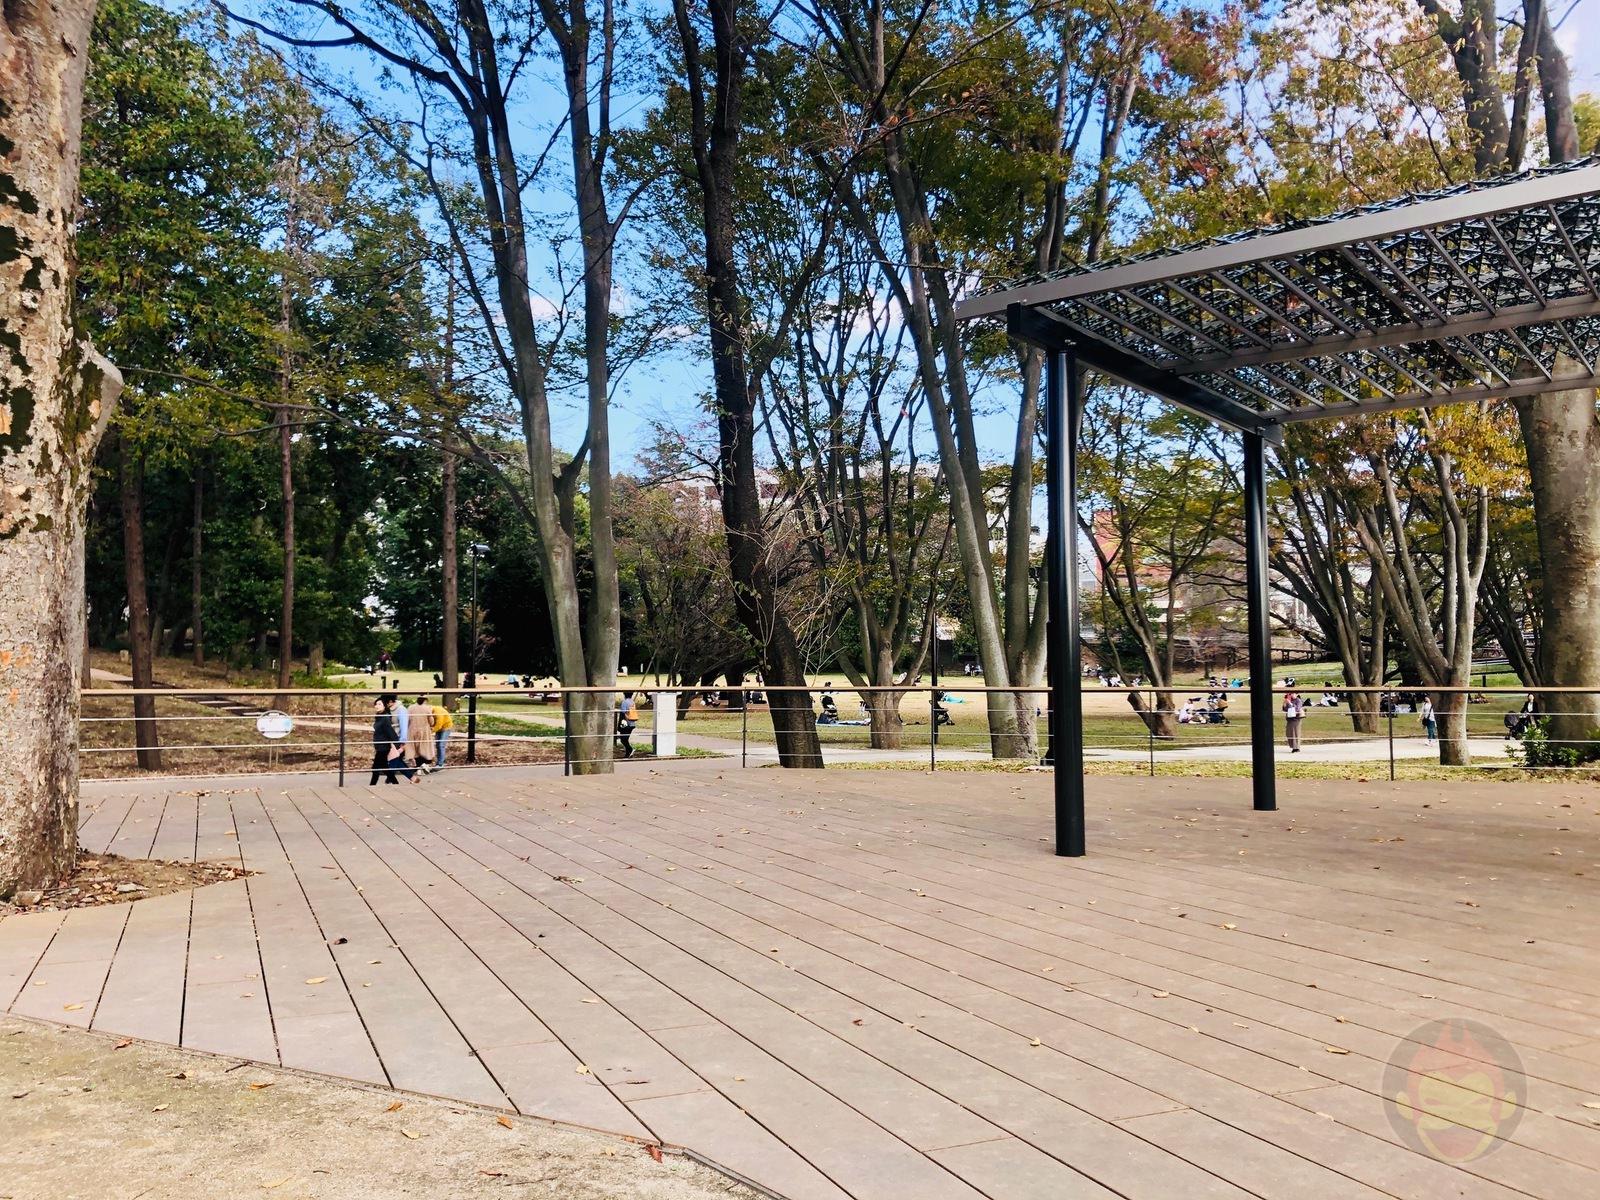 Tsuruma-Park-Minamimachid-Grandberry-Pak-10.jpeg